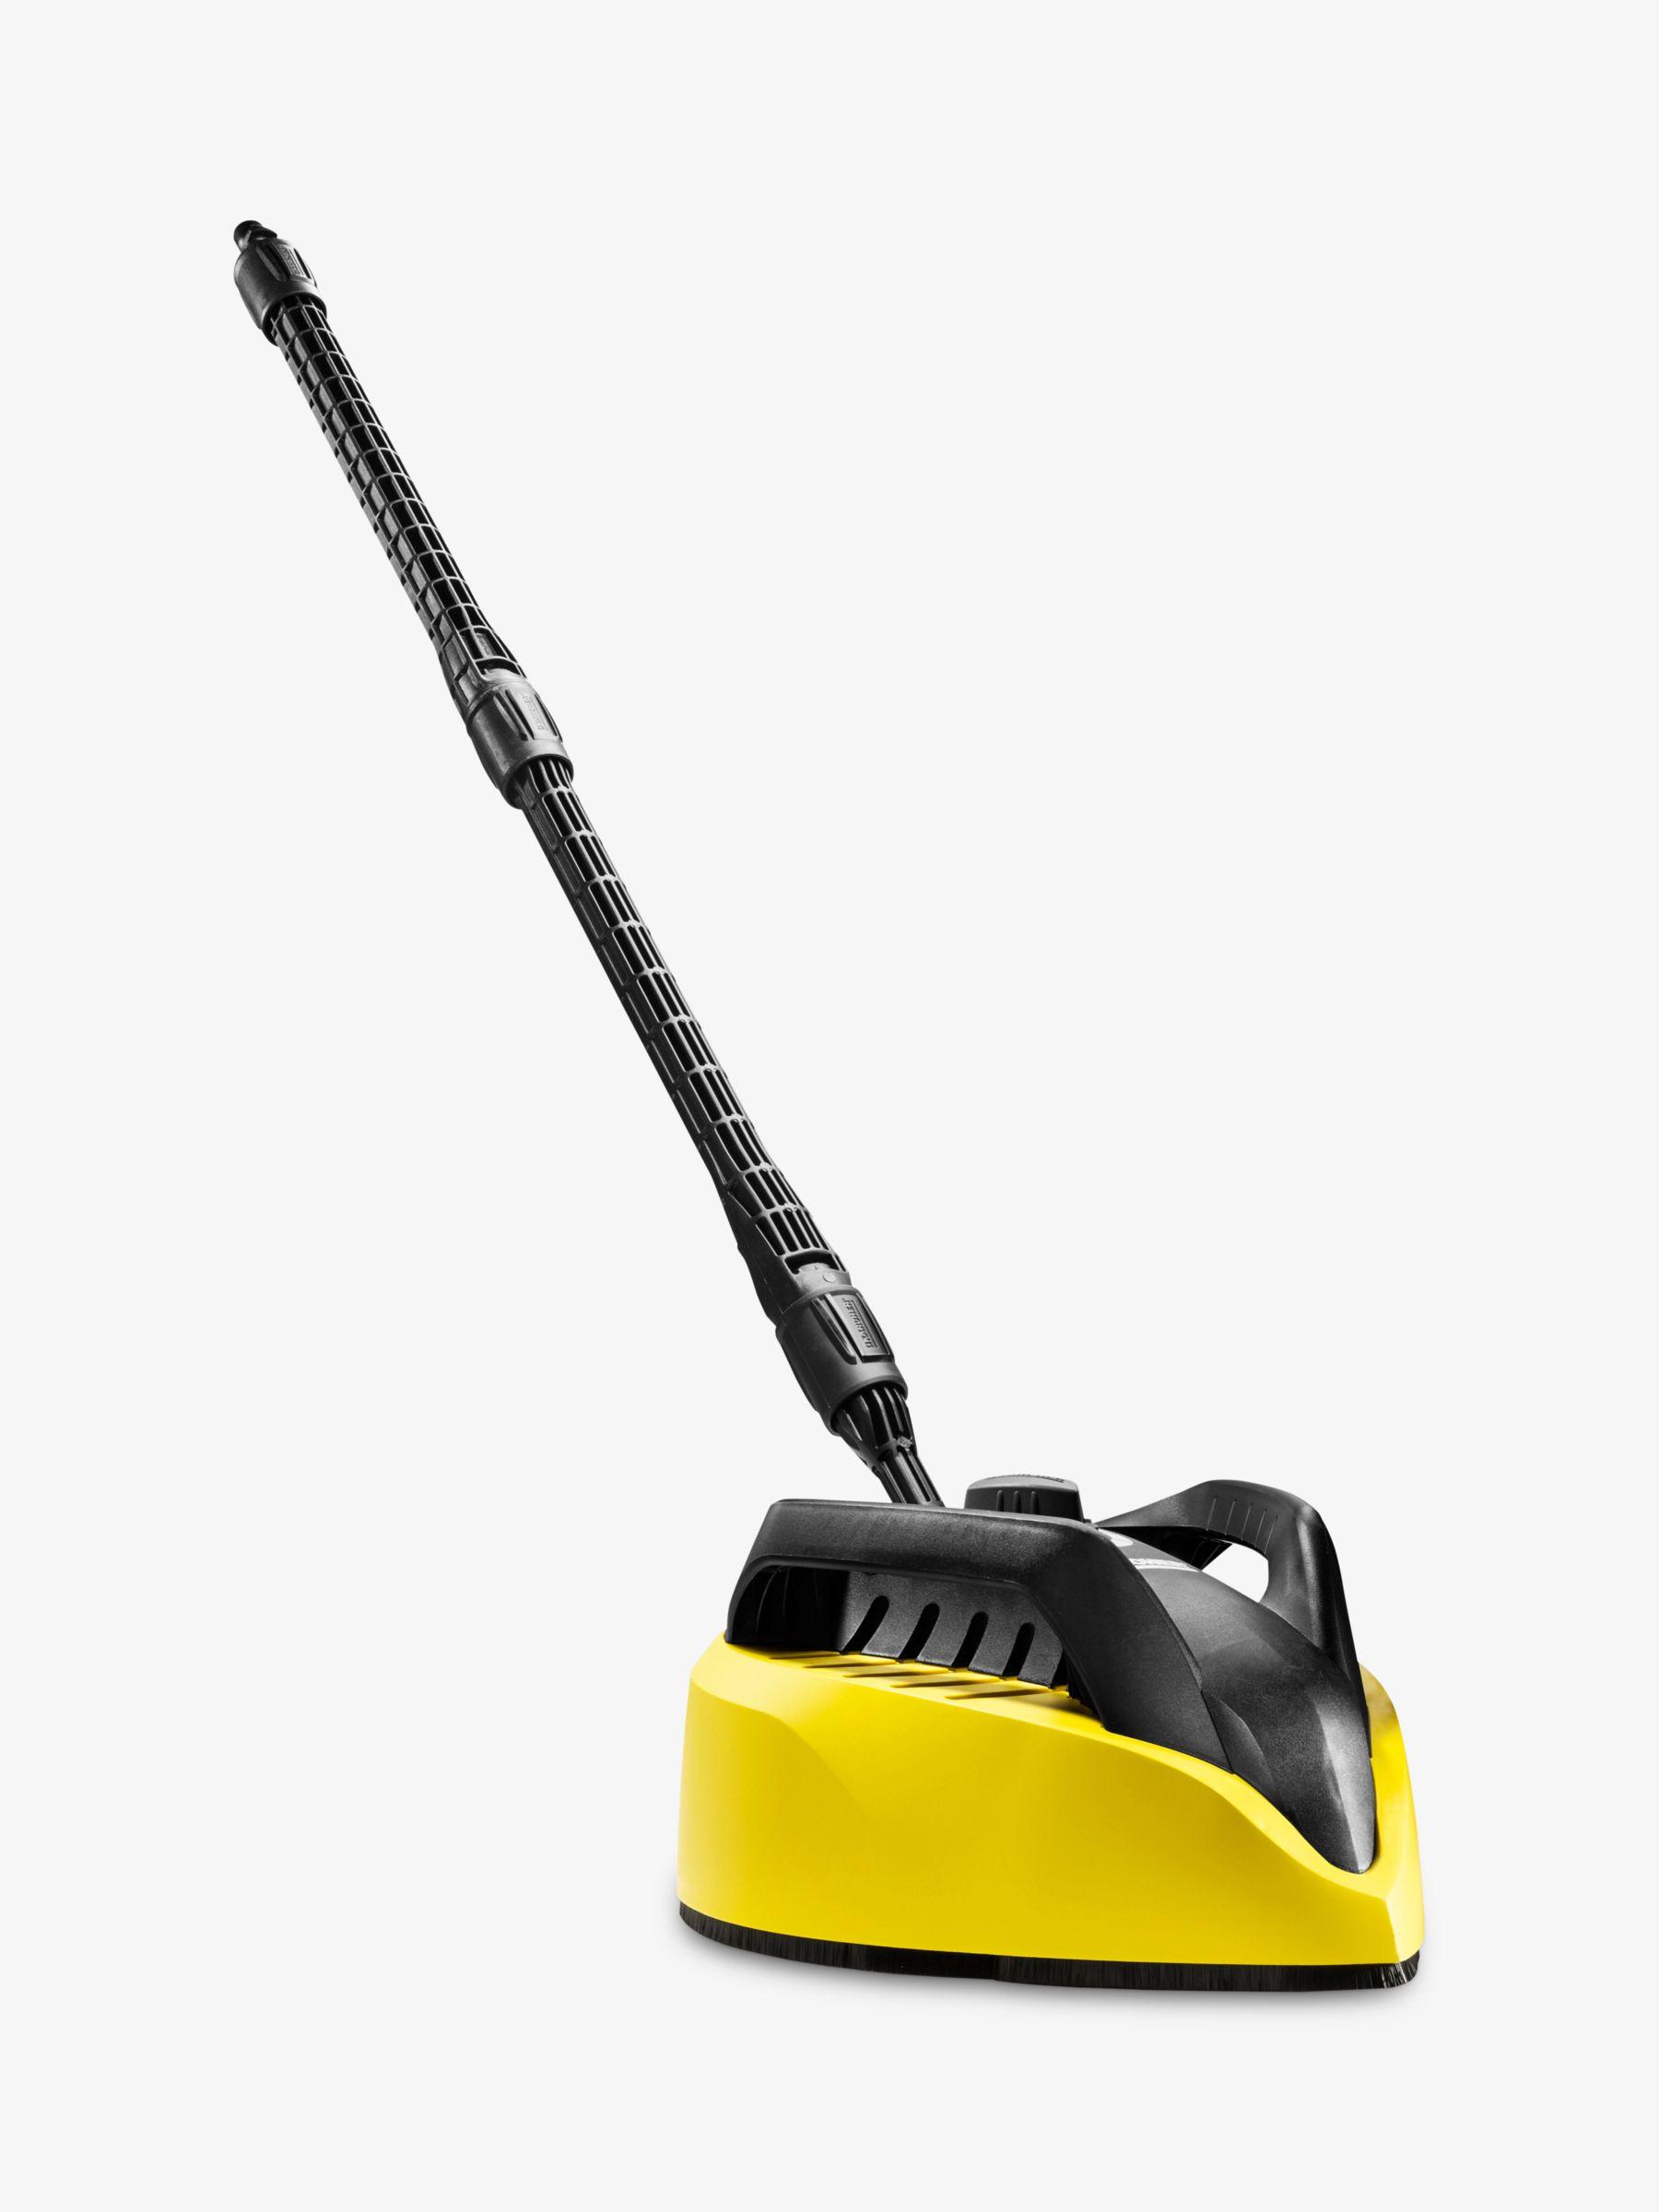 Karcher Kärcher T450 Patio Cleaner